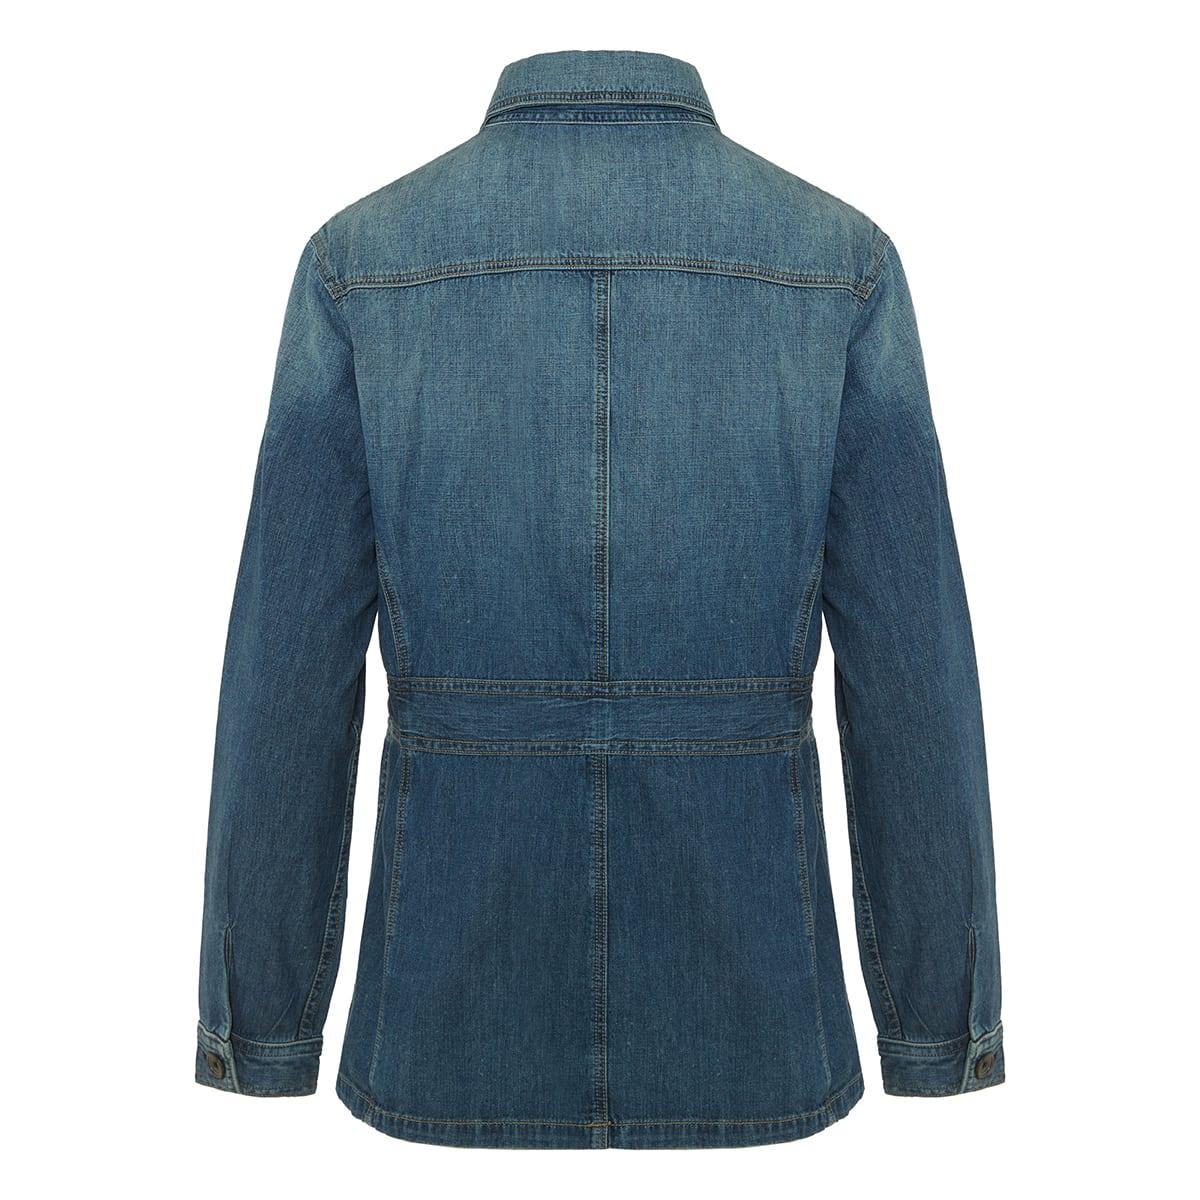 Blake denim jacket